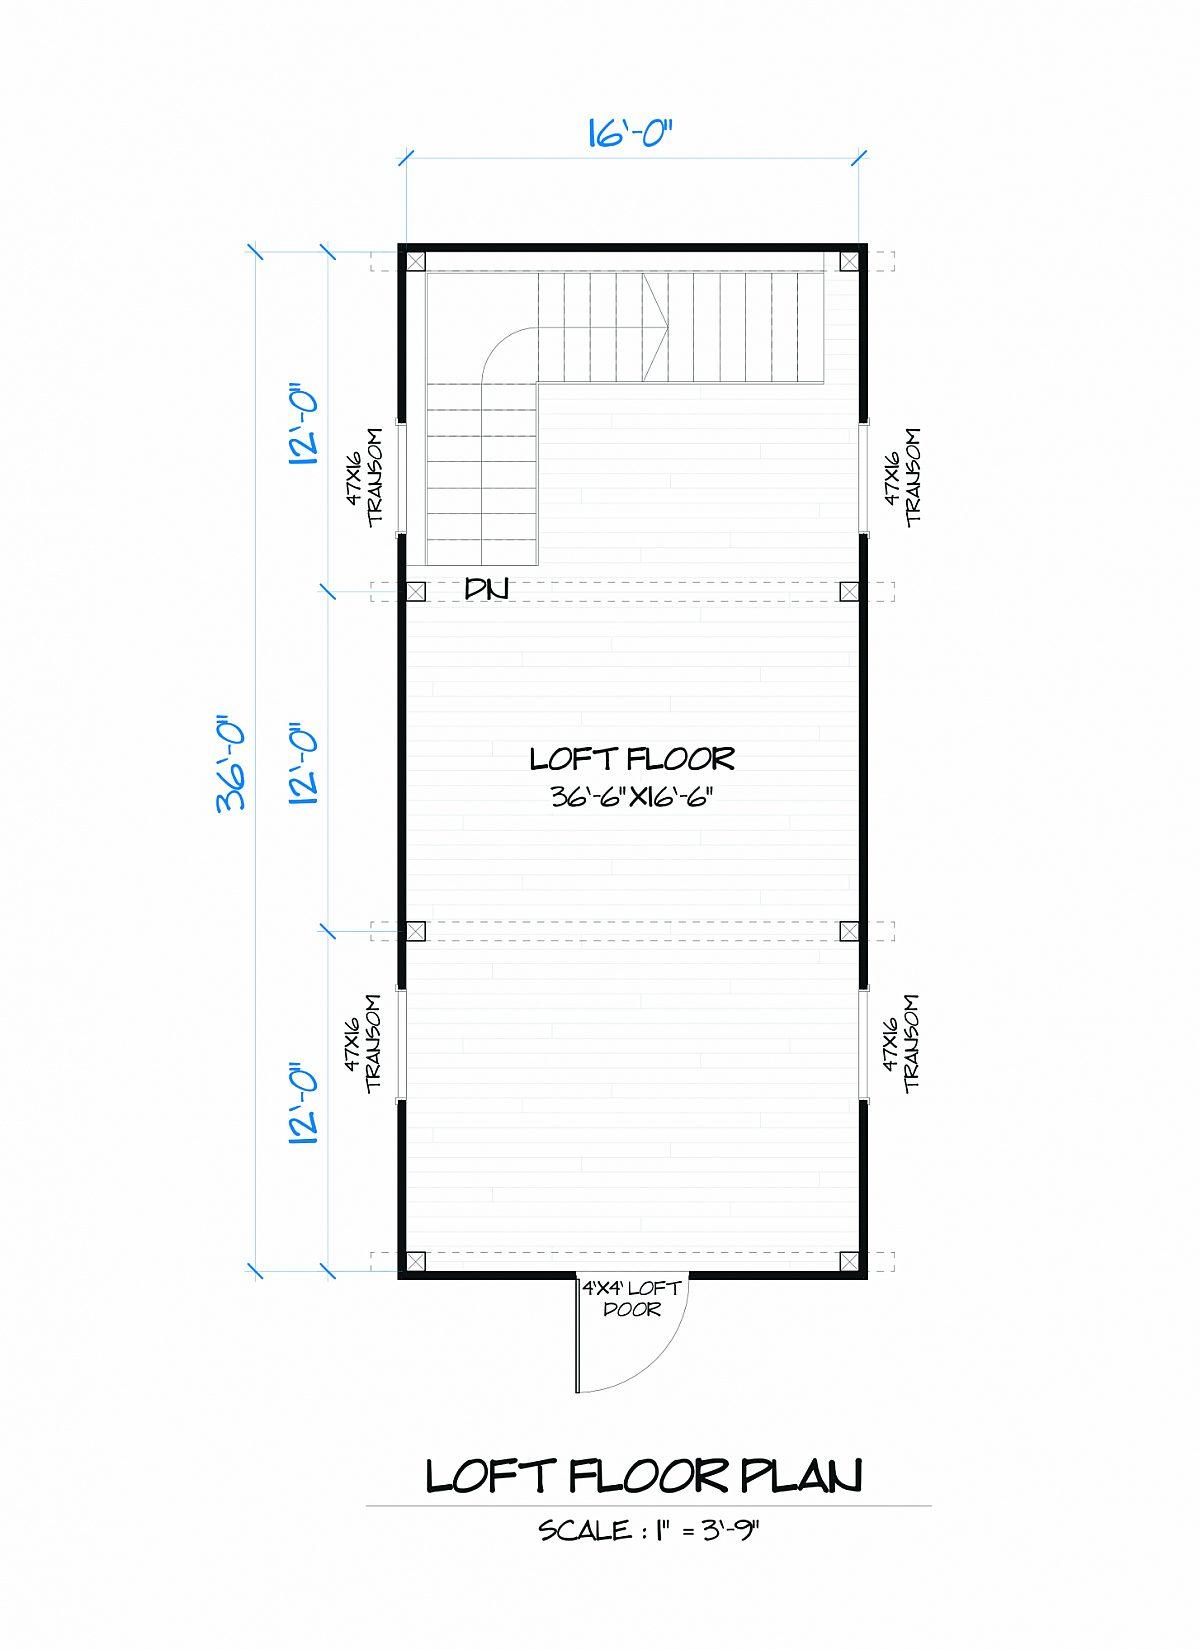 Timberlyne Laurel Barn Loft Floor Plan